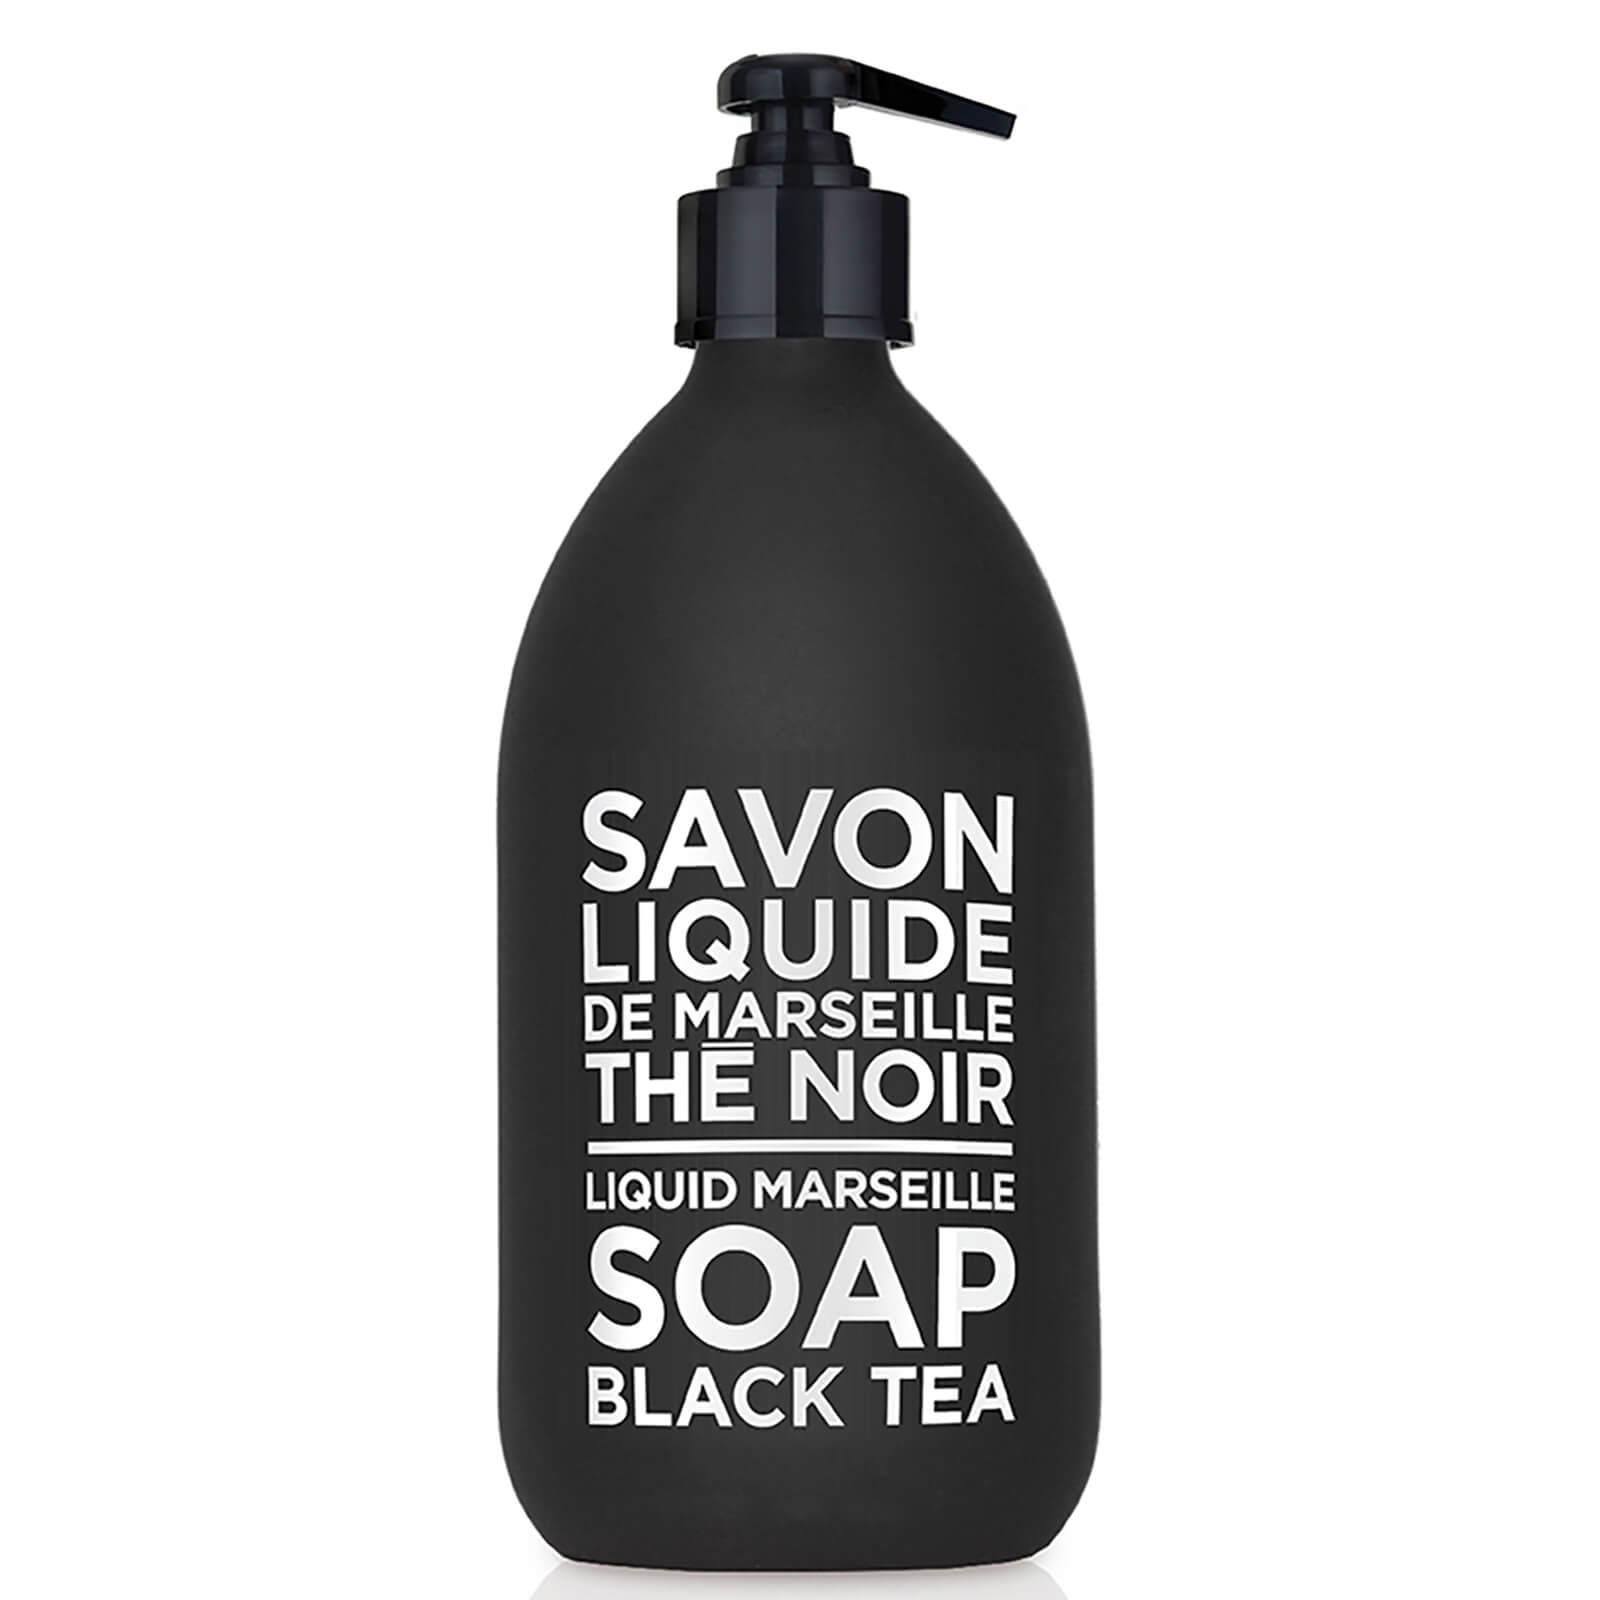 Compagnie de Provence Savon de Marseille Liquide Compagnie de Provence 500ml – Thé Noir